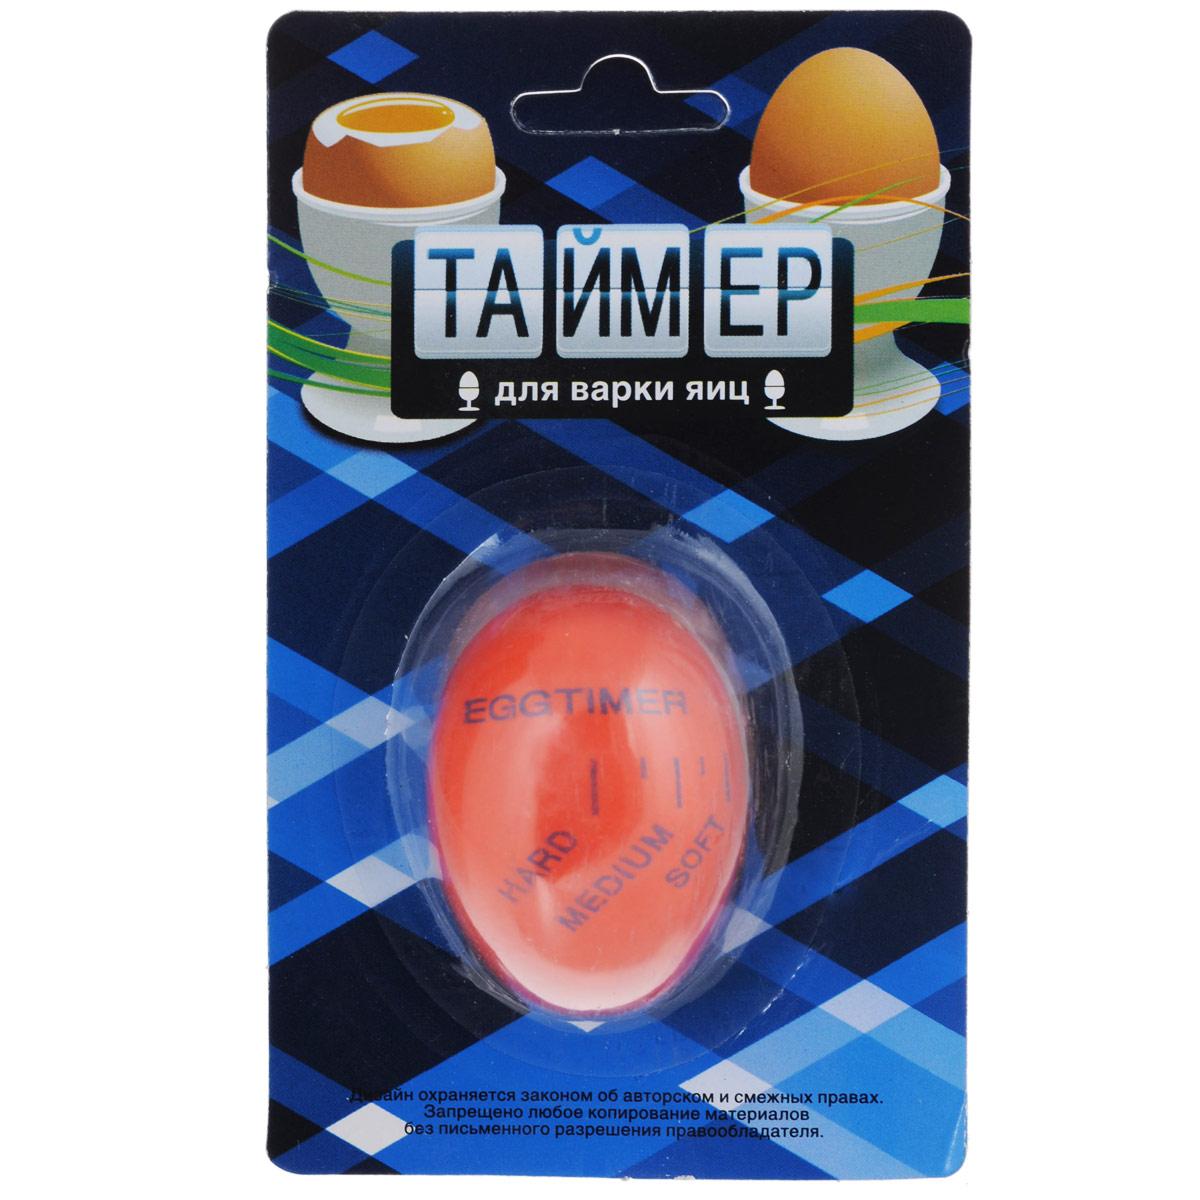 Таймер для варки яиц Egg Timer egg shaped stainless steel mechanical twist timer 60 minutes